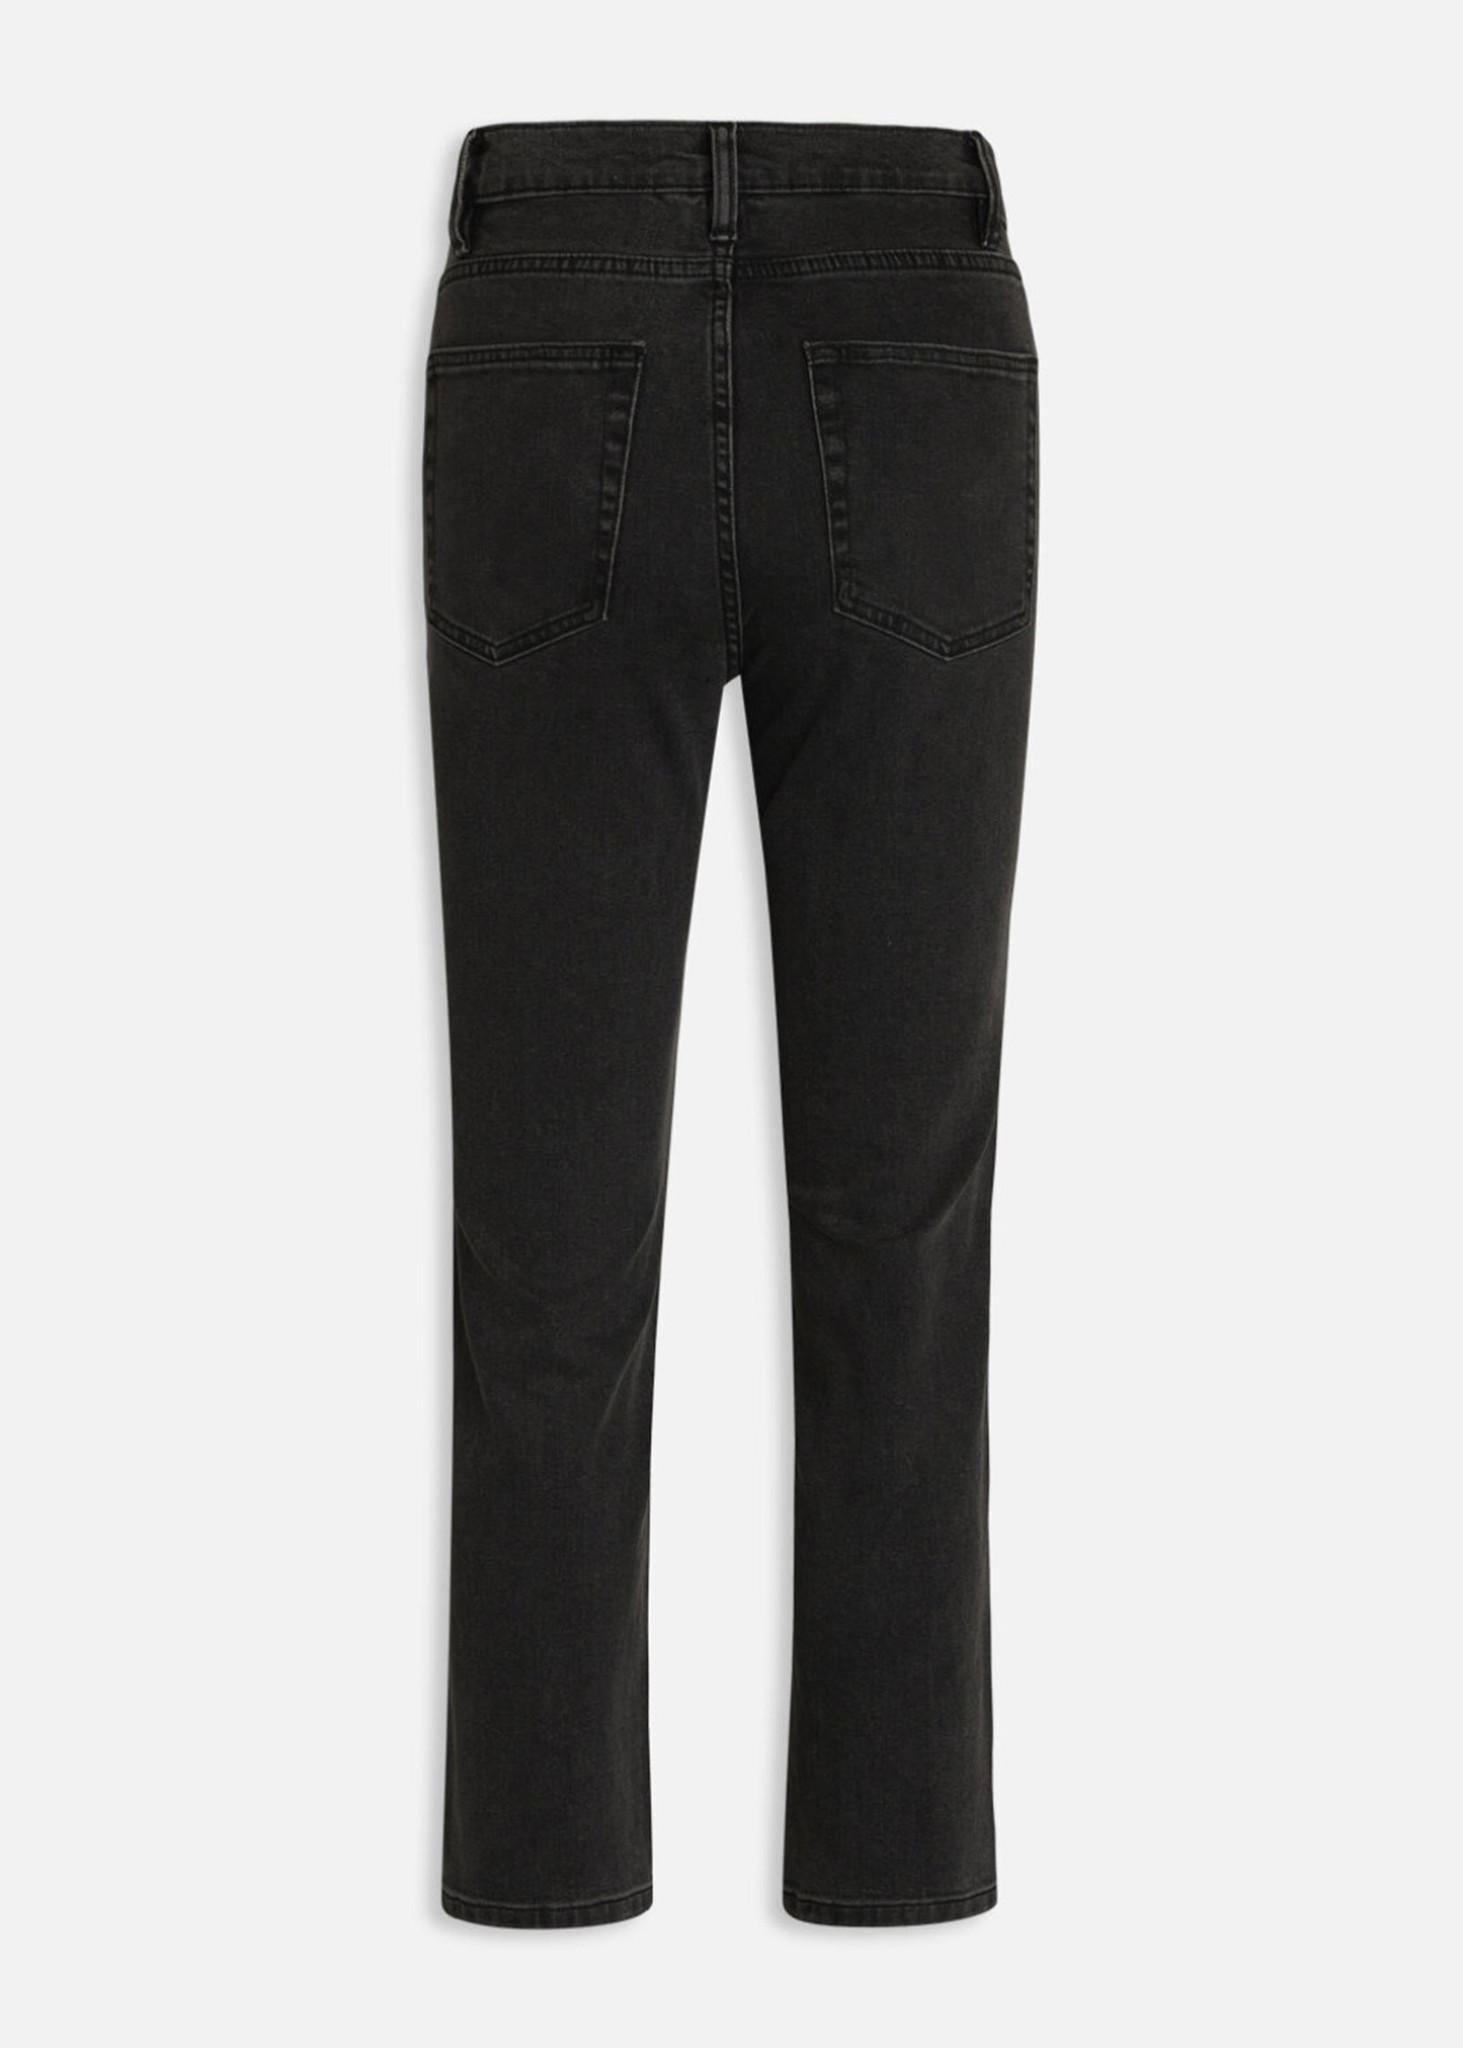 Black Wash Jeans-2